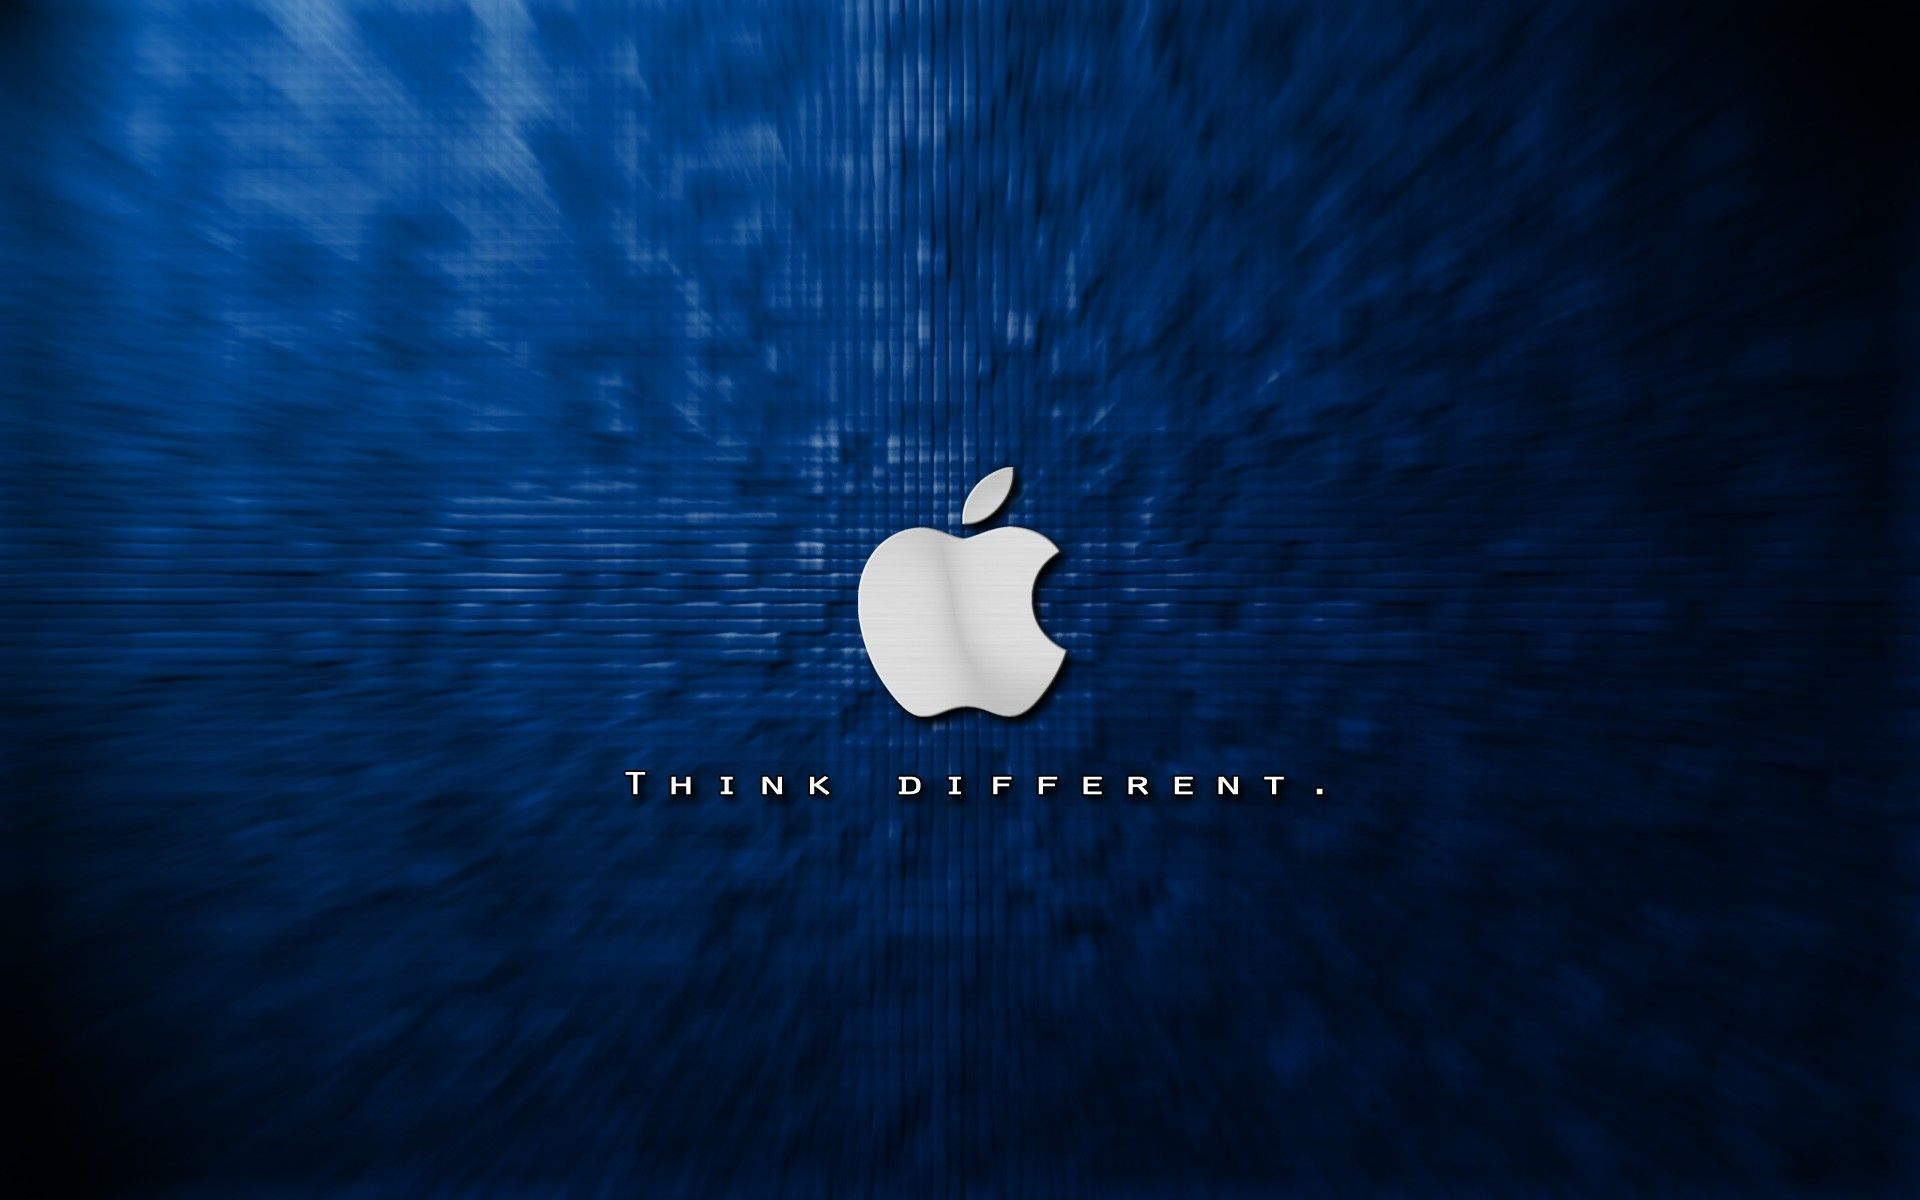 12 121827 free hd apple wallpaper images ultra hd ipad